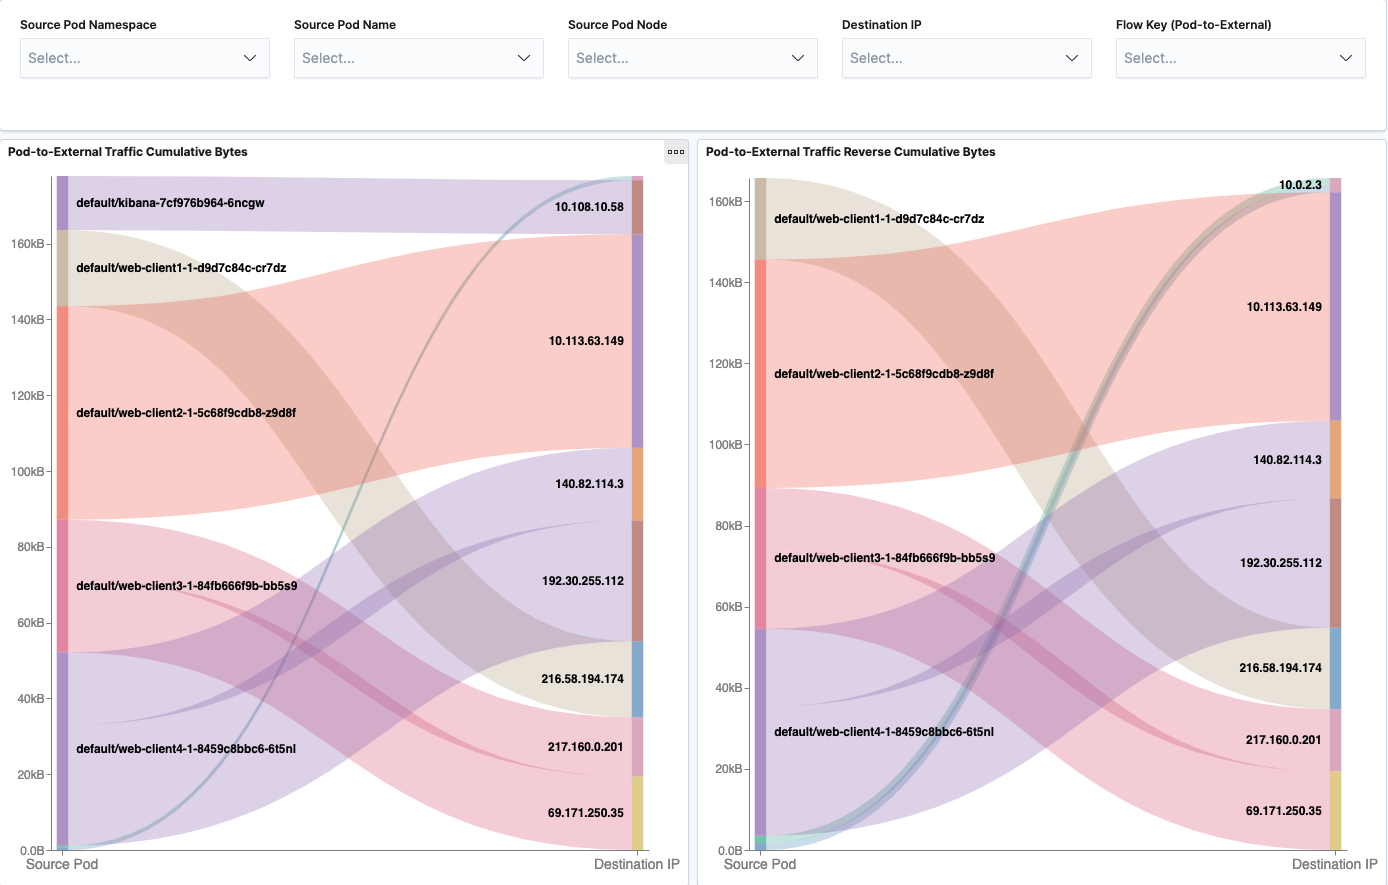 Flow Visualization Pod-to-External Dashboard